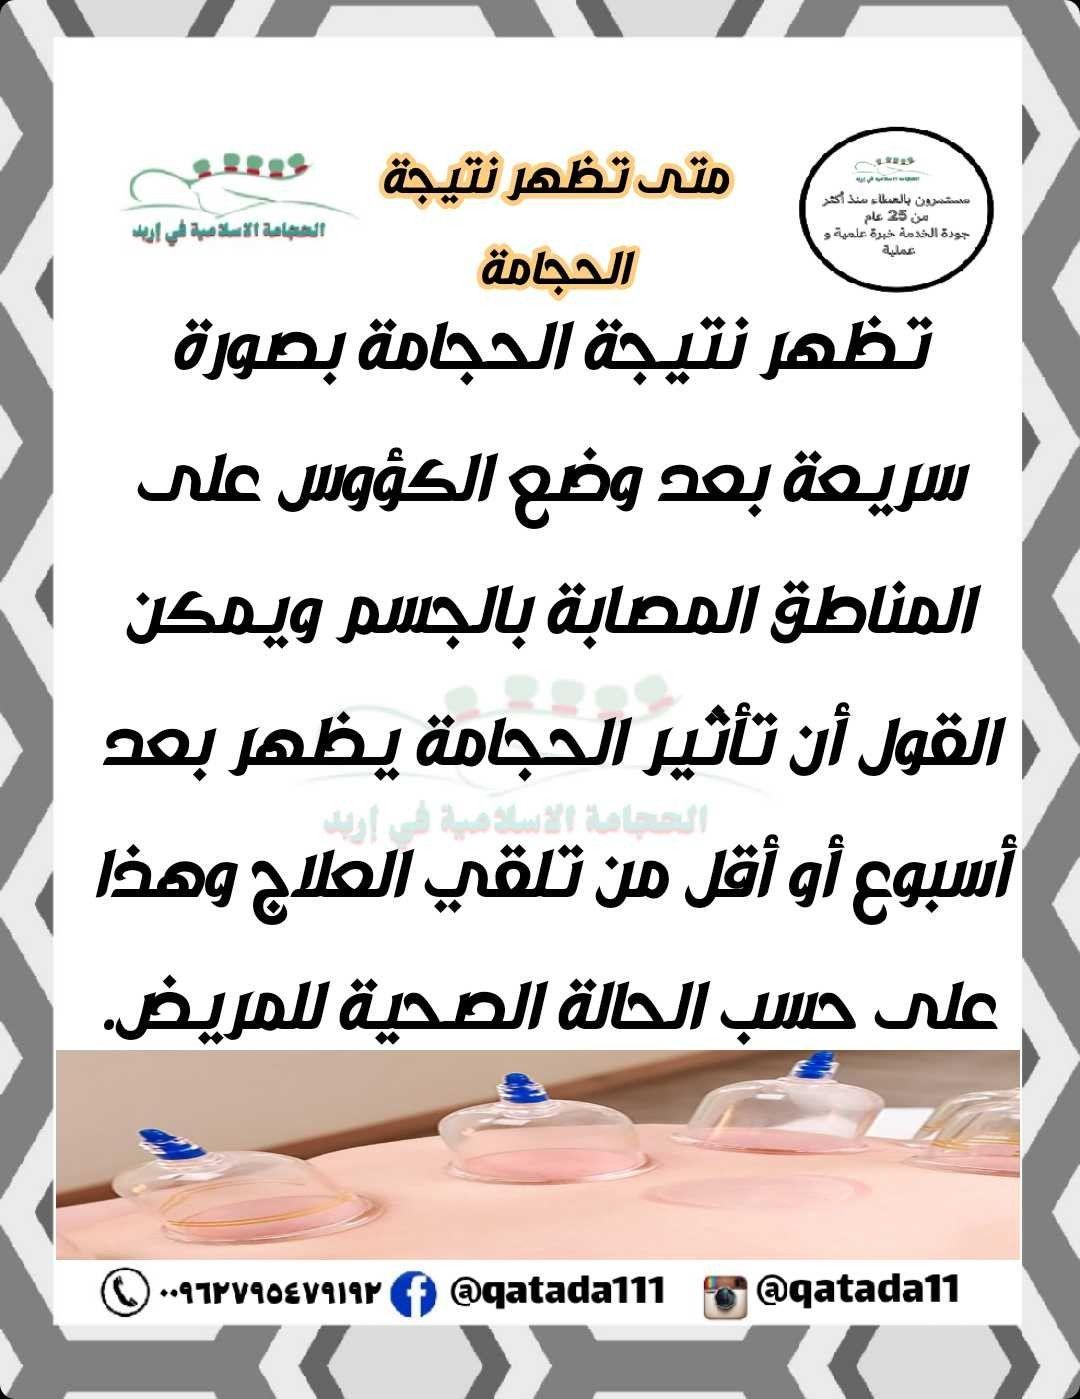 Pin By الحجامة الإسلامية On الحجامة الاسلاميه Shopping